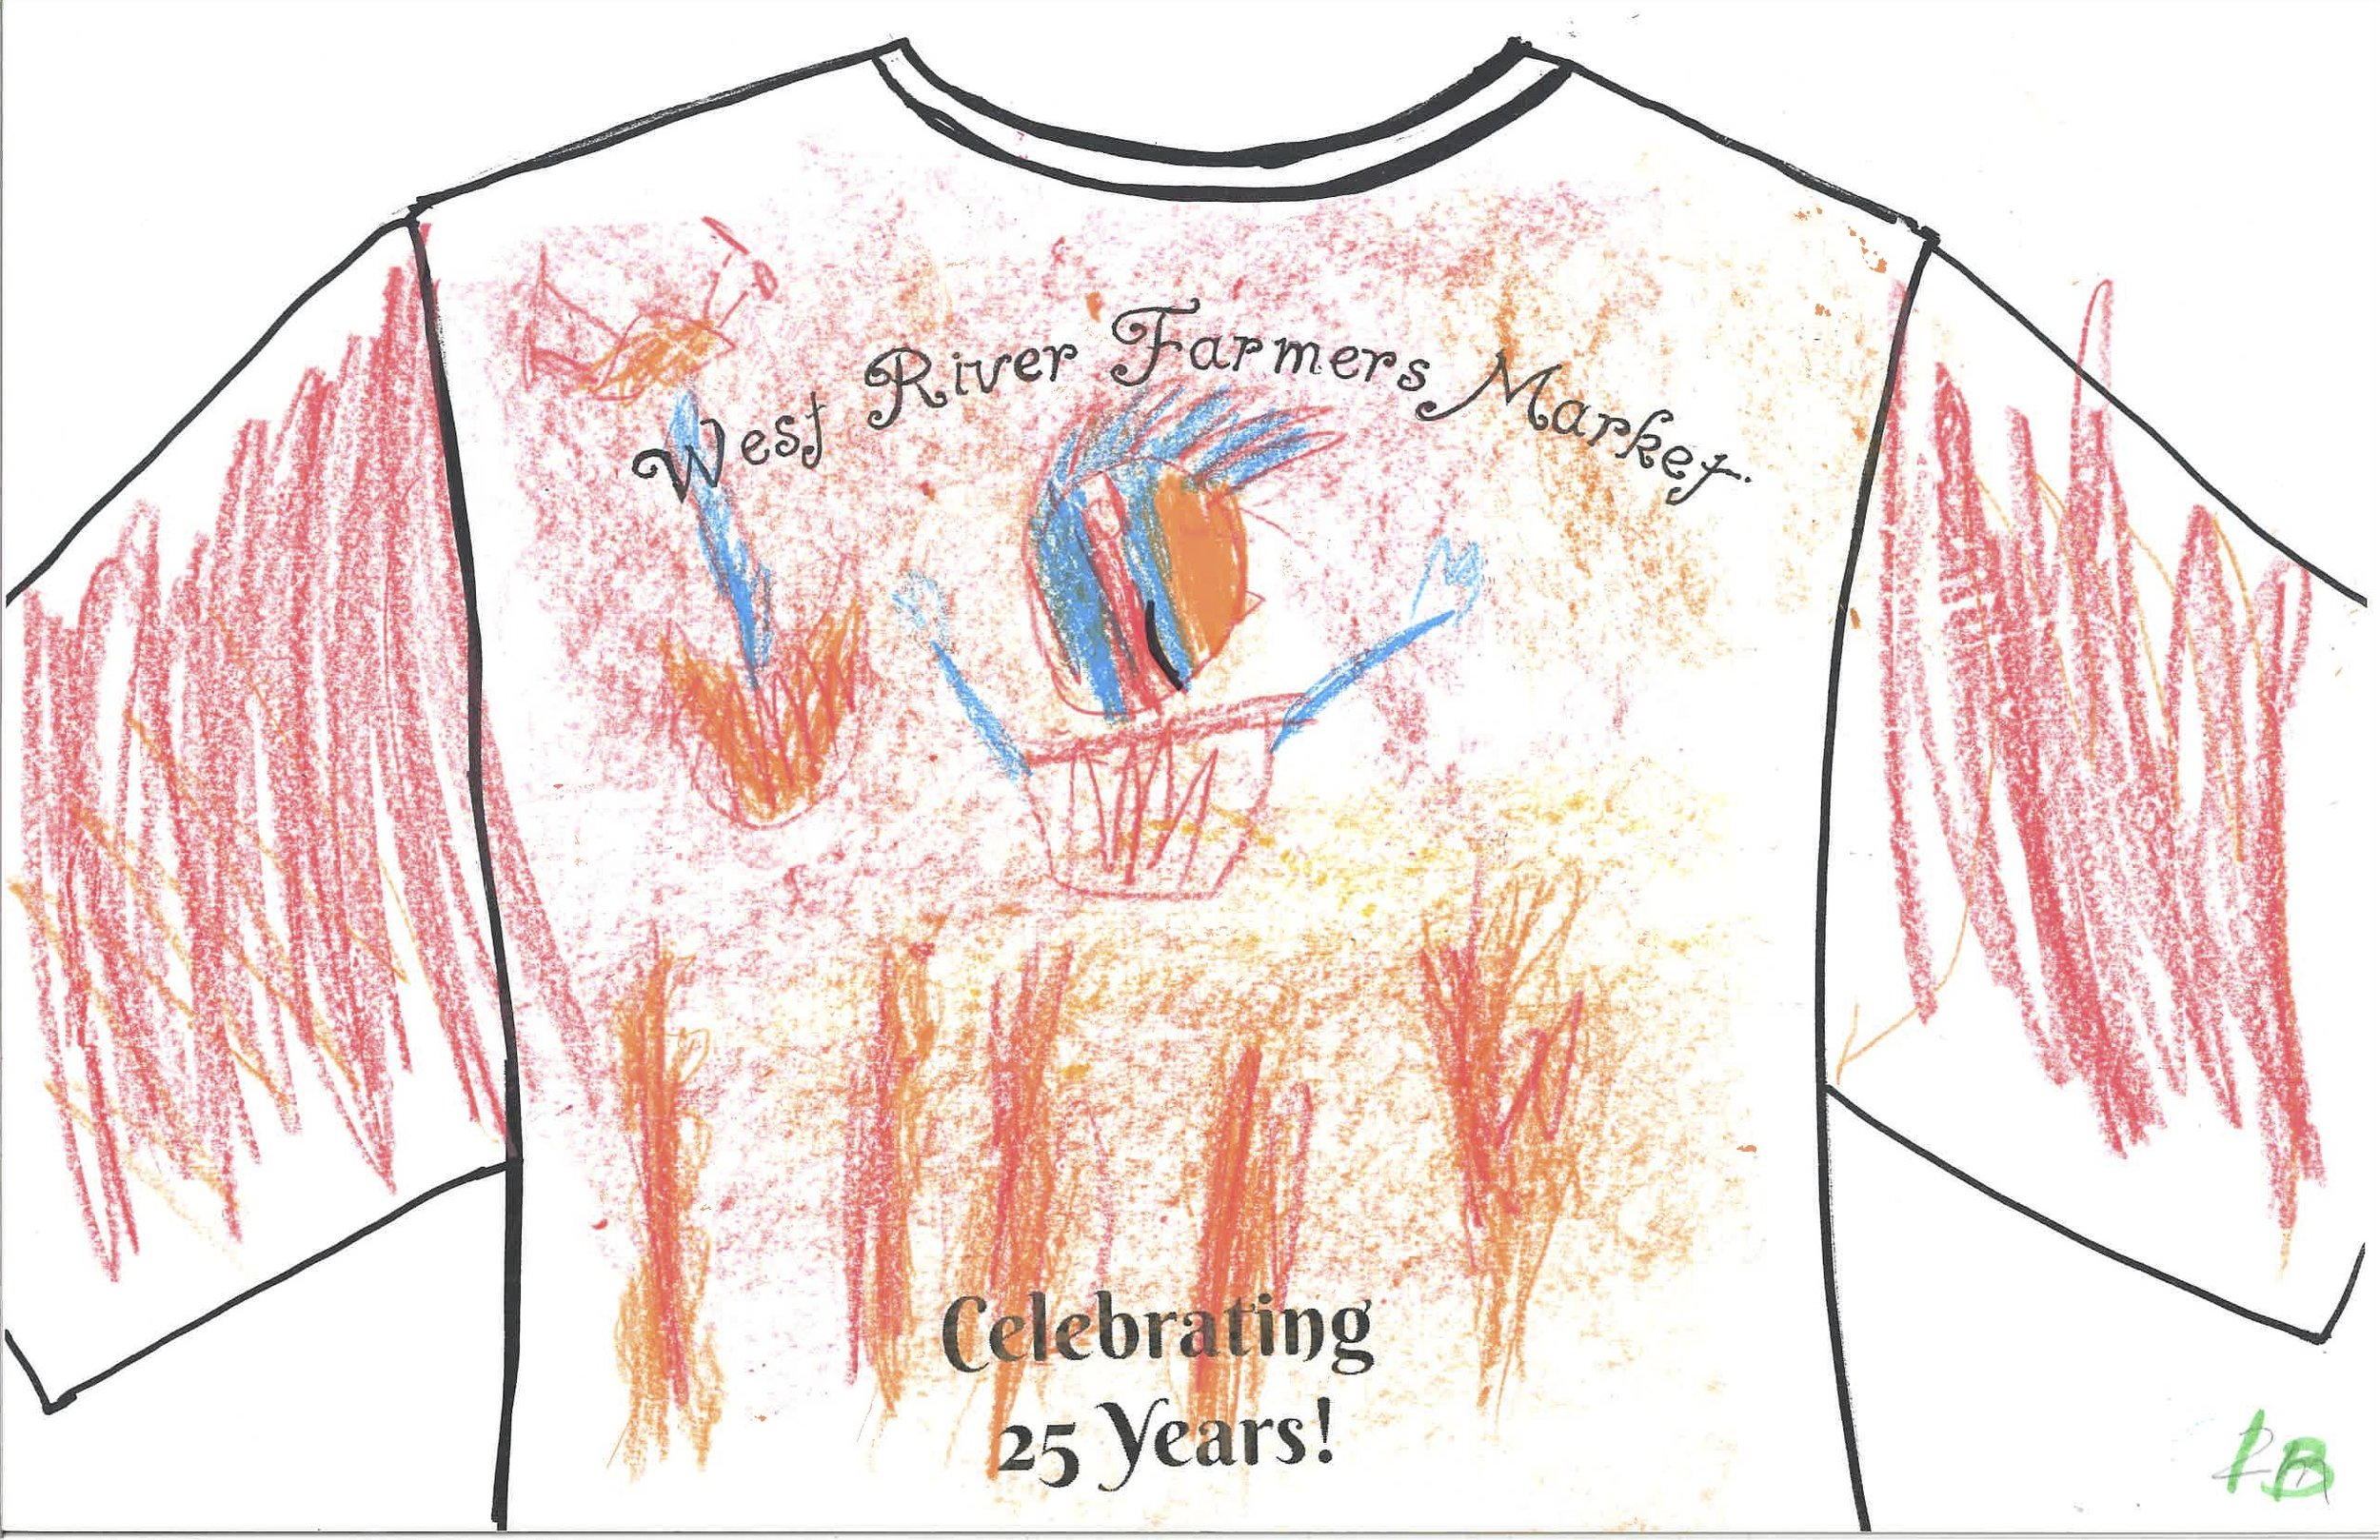 Flood Brook T Shirt Design 35.jpg